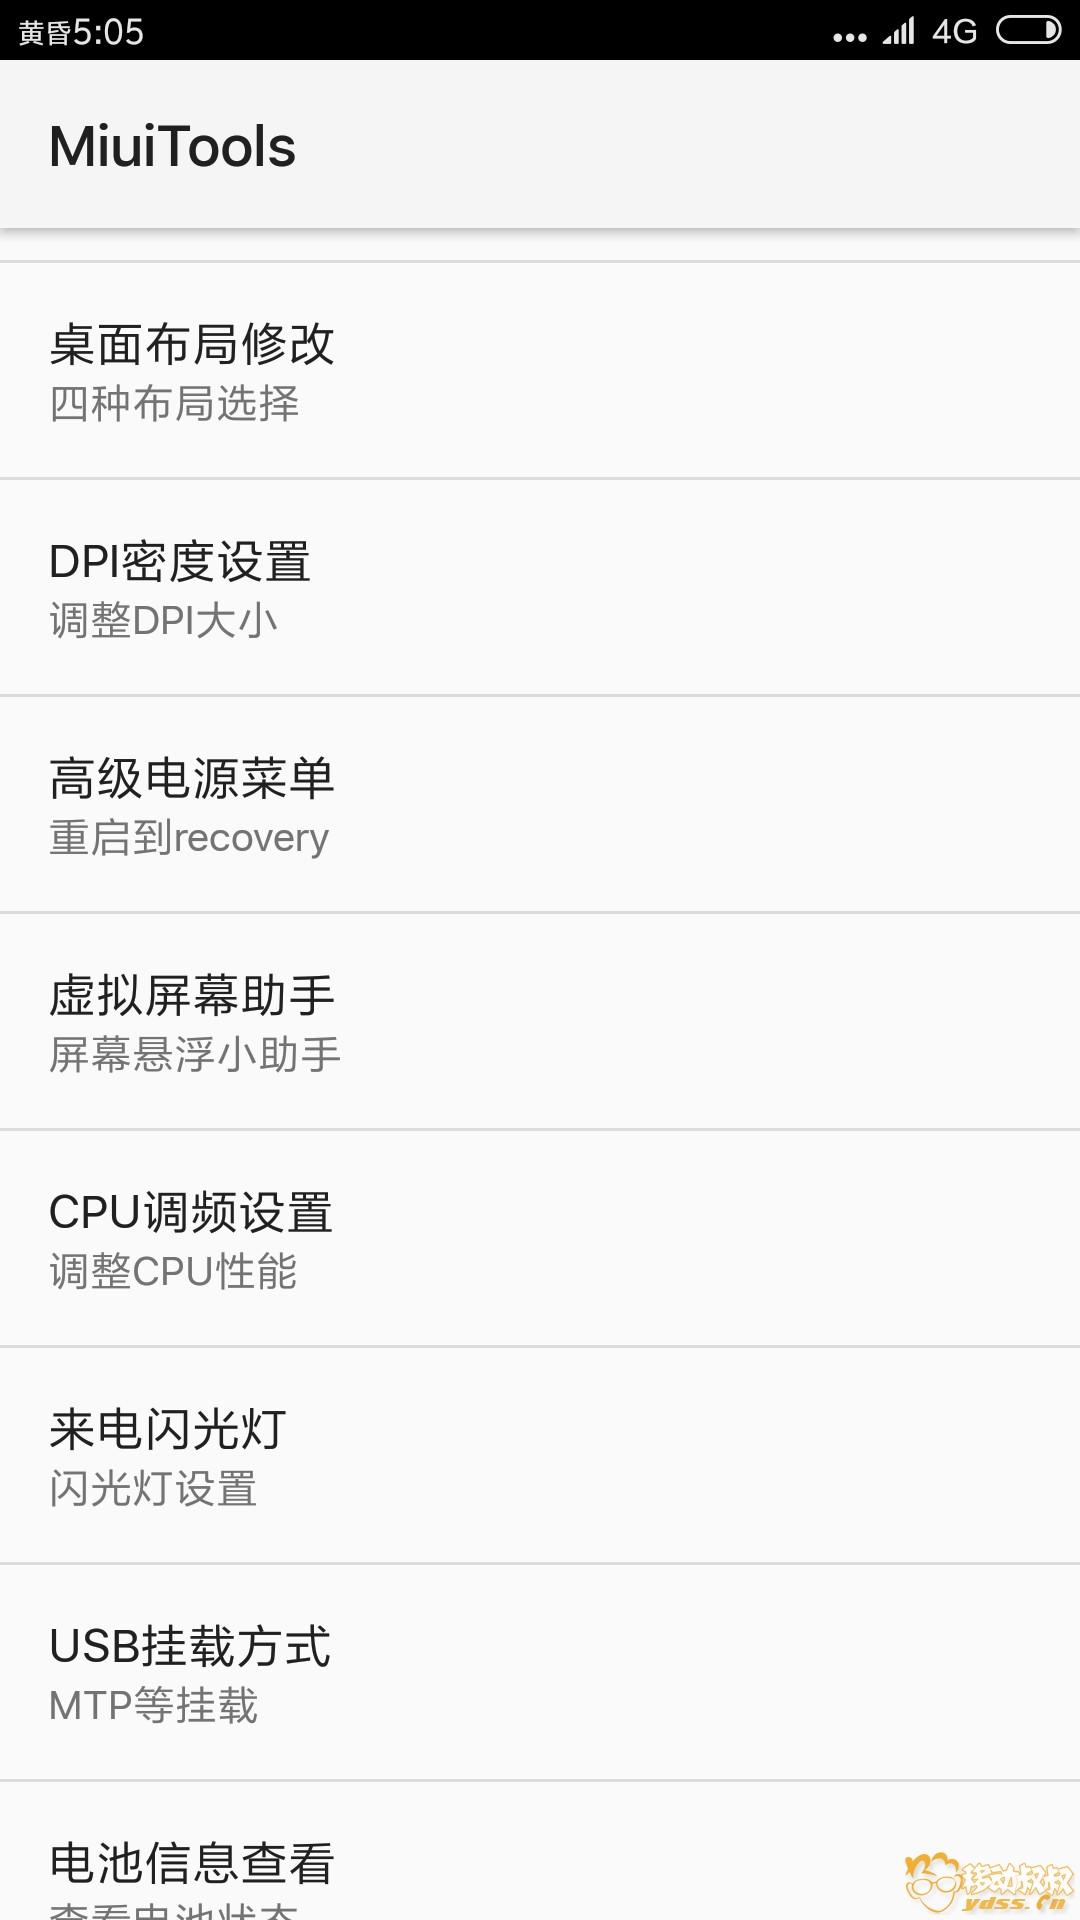 Screenshot_2018-07-04-17-05-03-460_com.anzhi.hwsettings.jpg